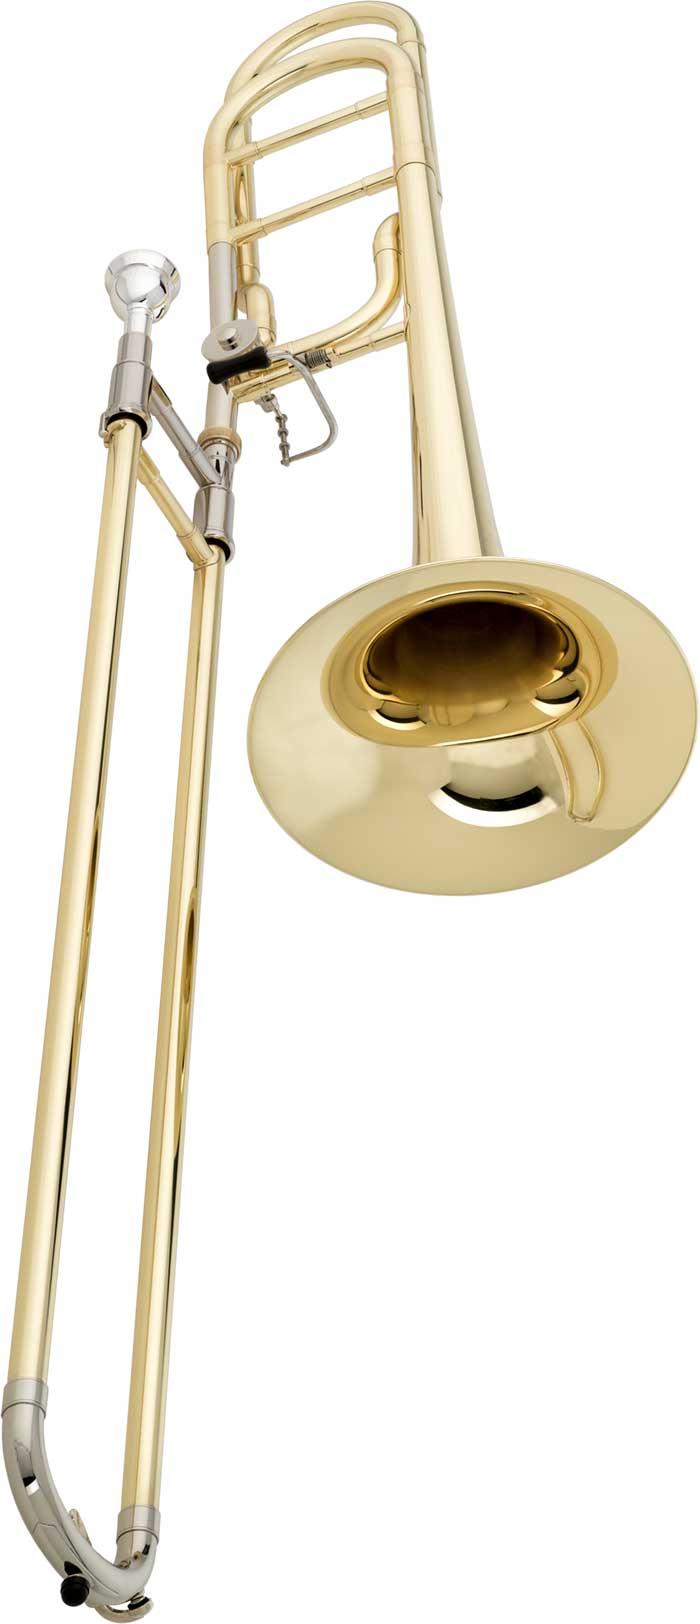 547 Tenor Trombone